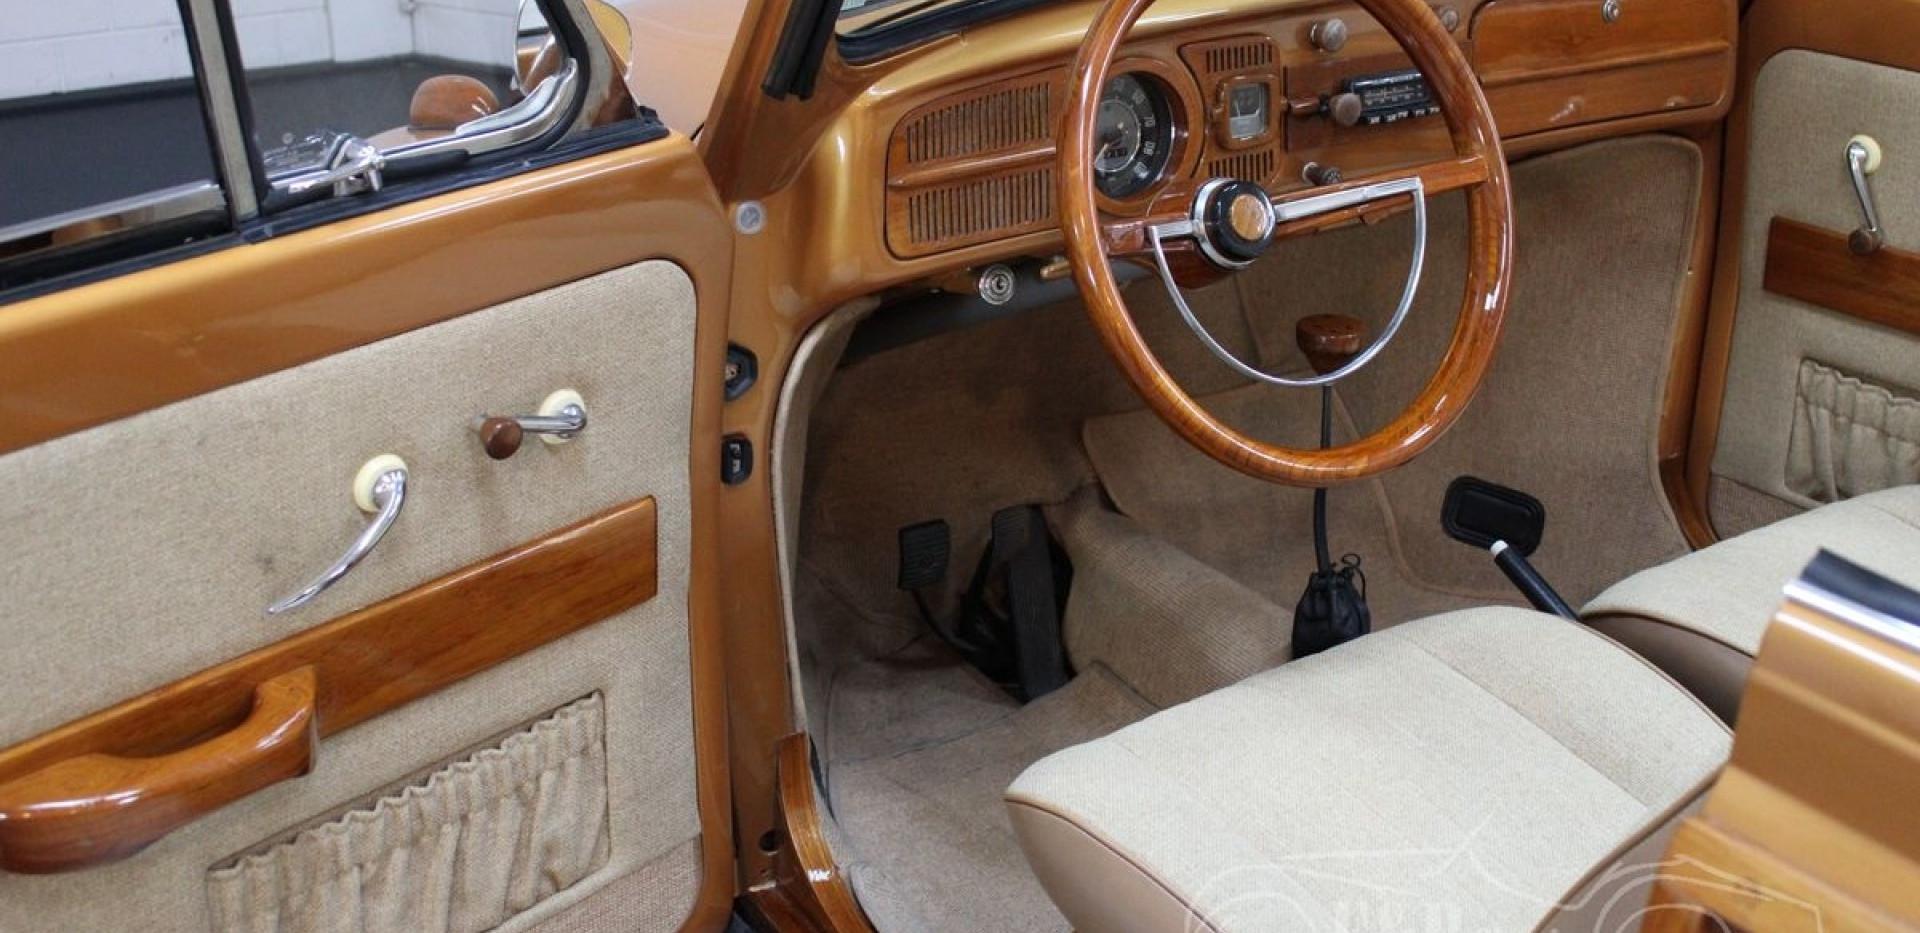 volkswagen-kever-woody-1966-v1273-038.jp